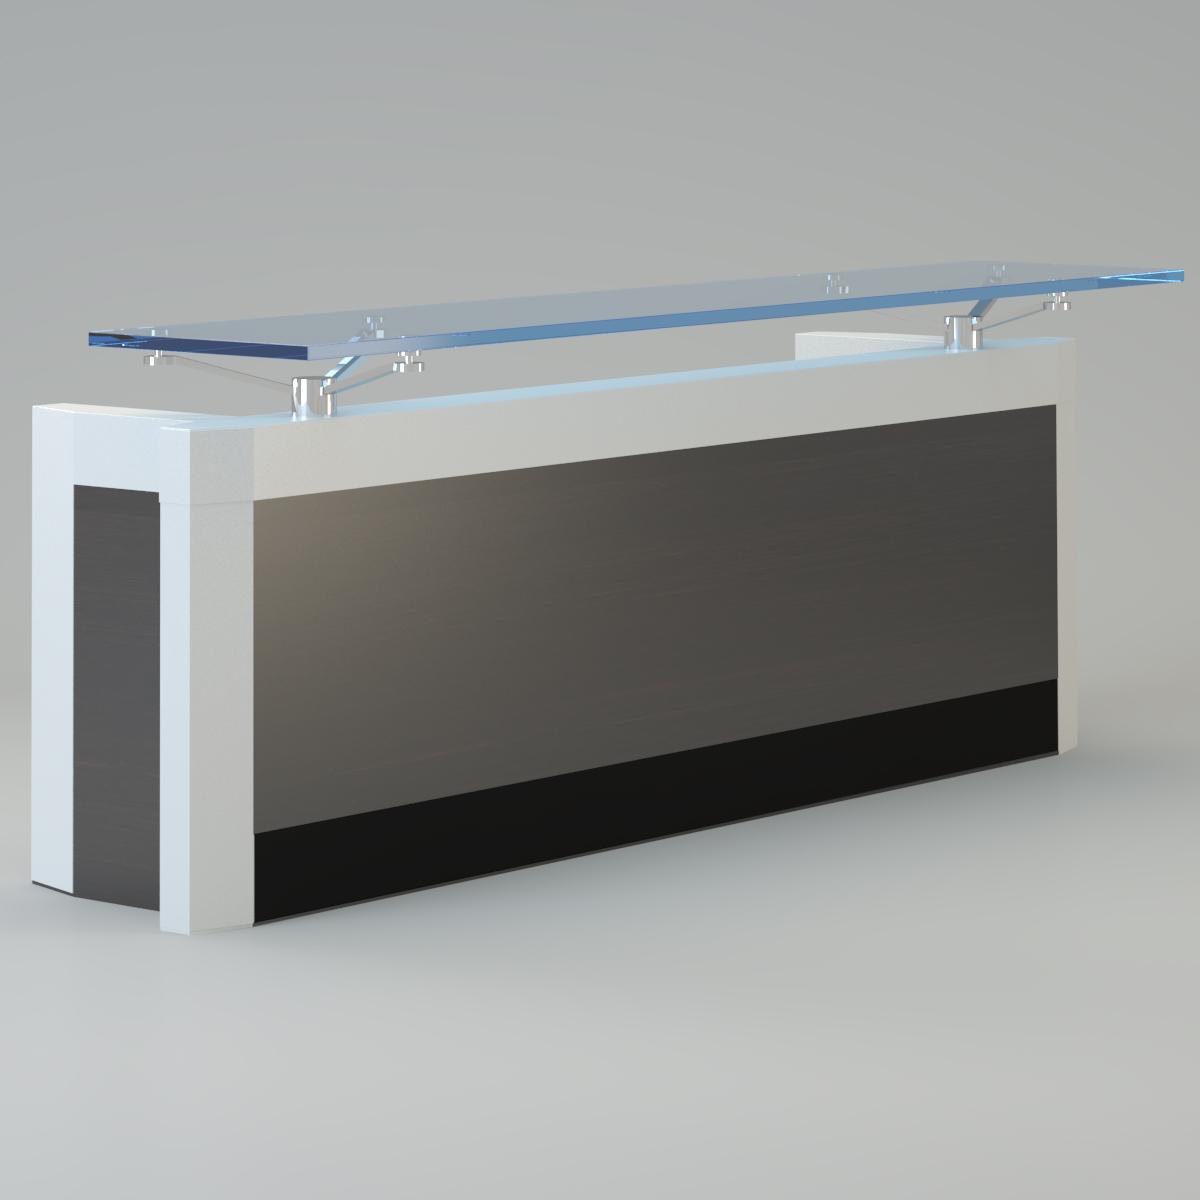 Great ... Contemporary Reception Desk 3d Model Max 3 ...